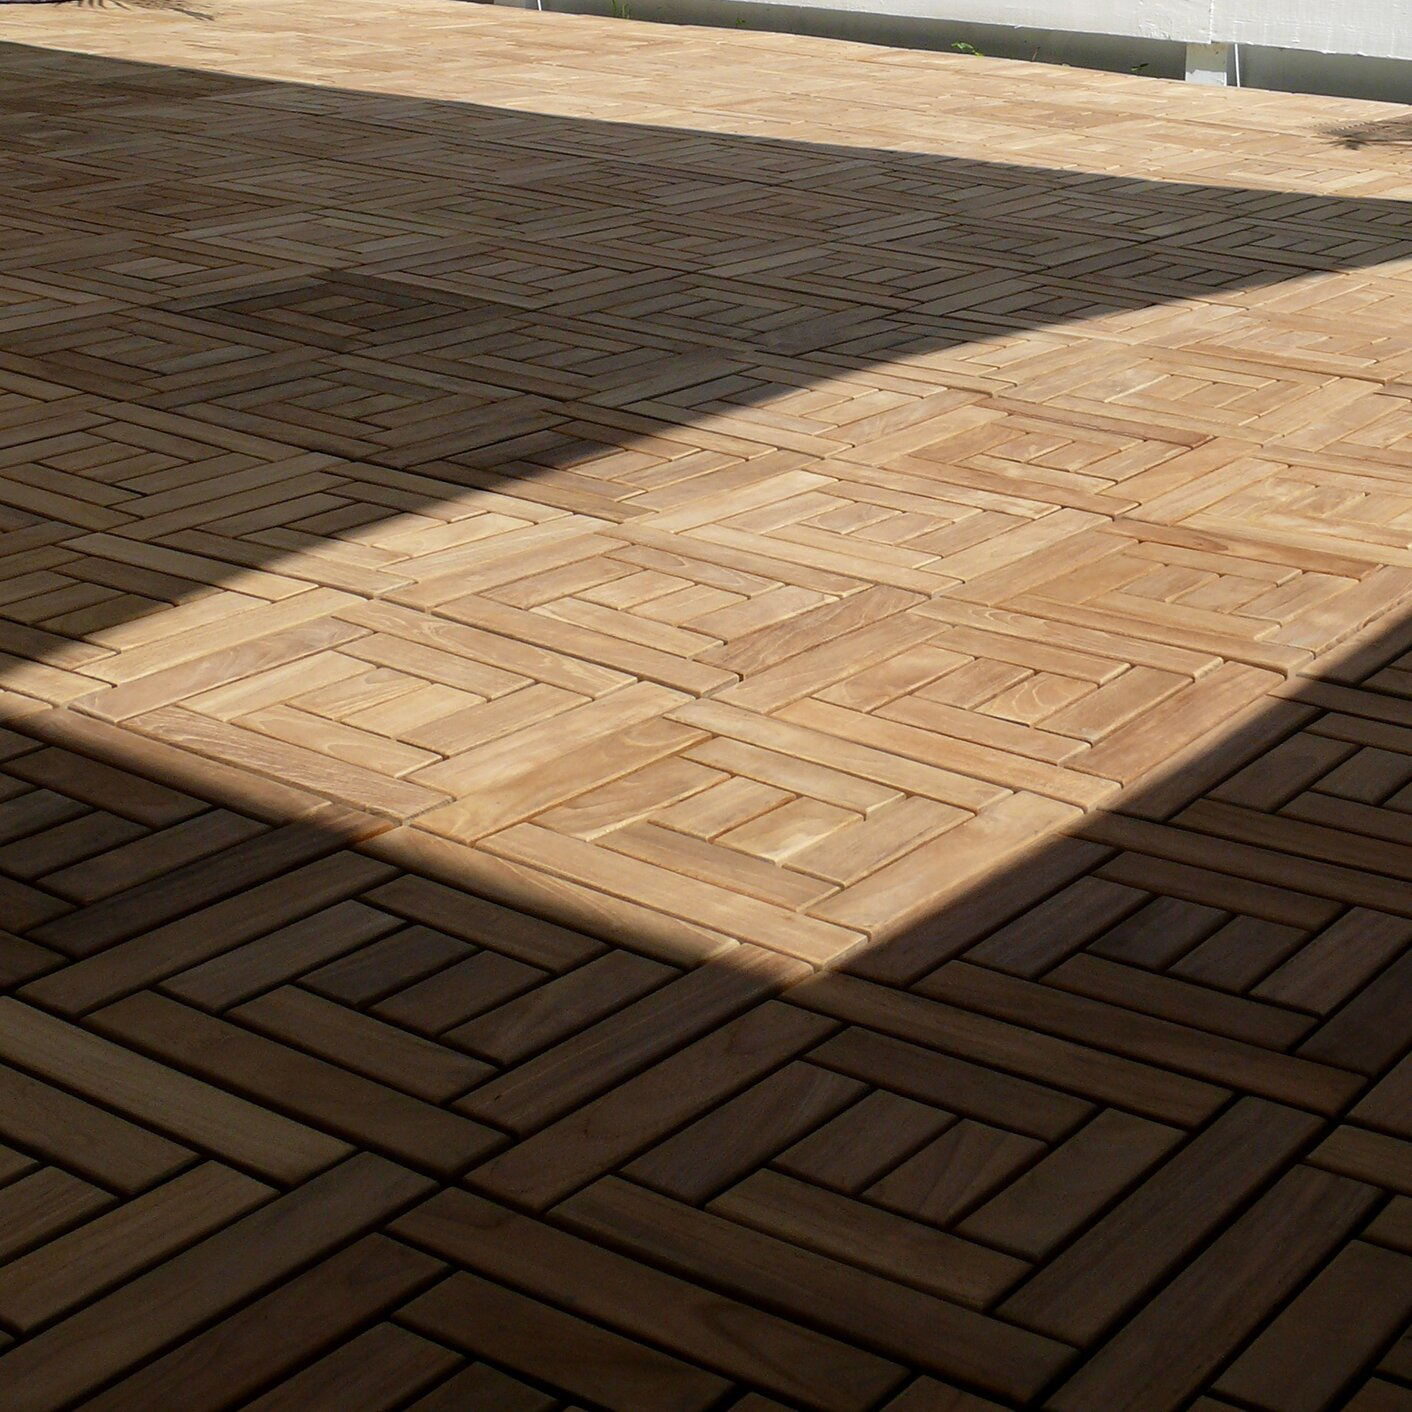 Teak Patio Flooring Tiles Home Design Ideas and